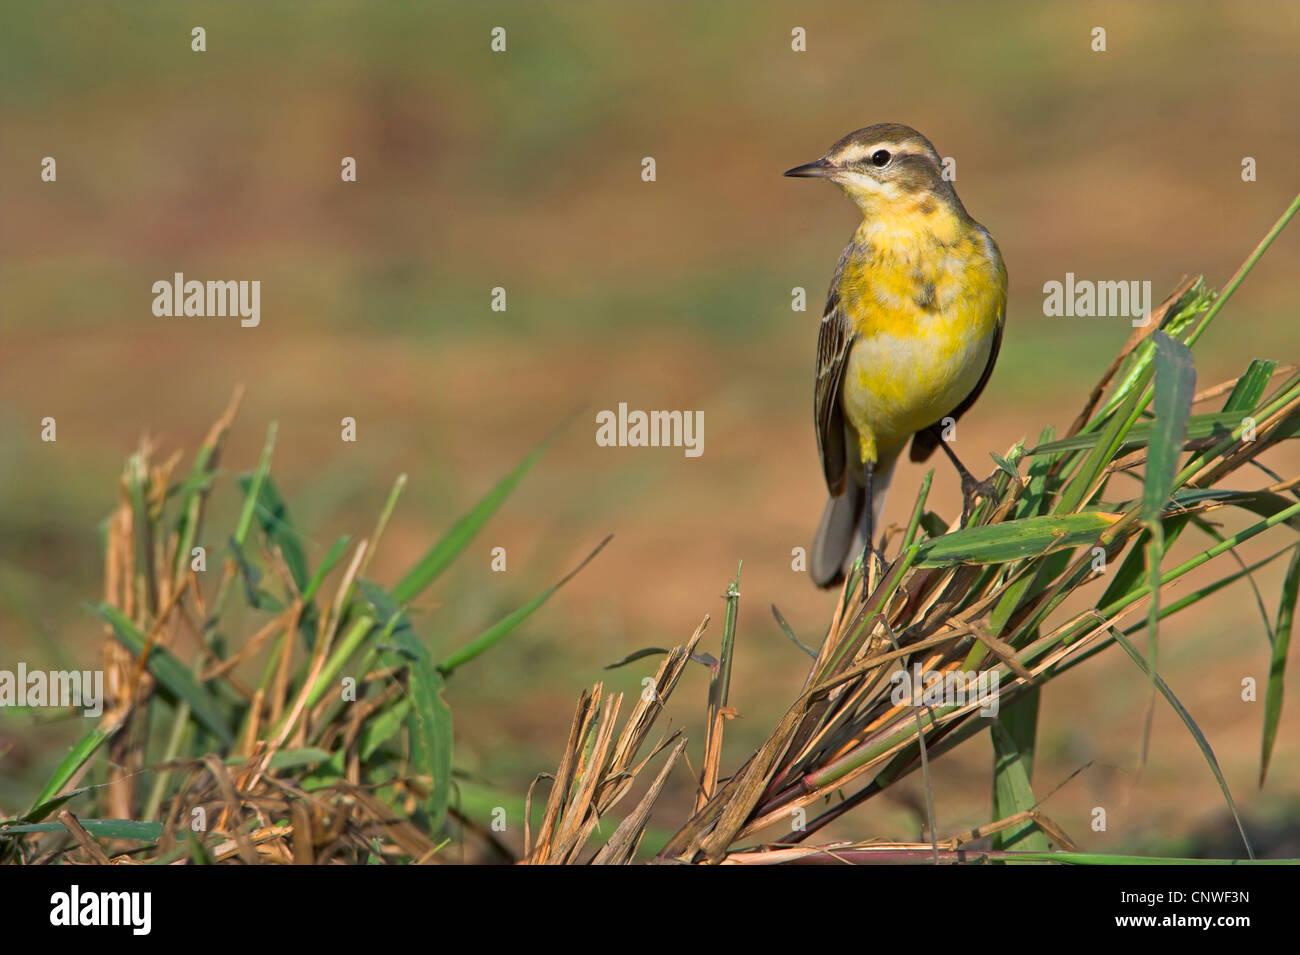 yellow wagtail (Motacilla flava), sitting in grass, Oman - Stock Image